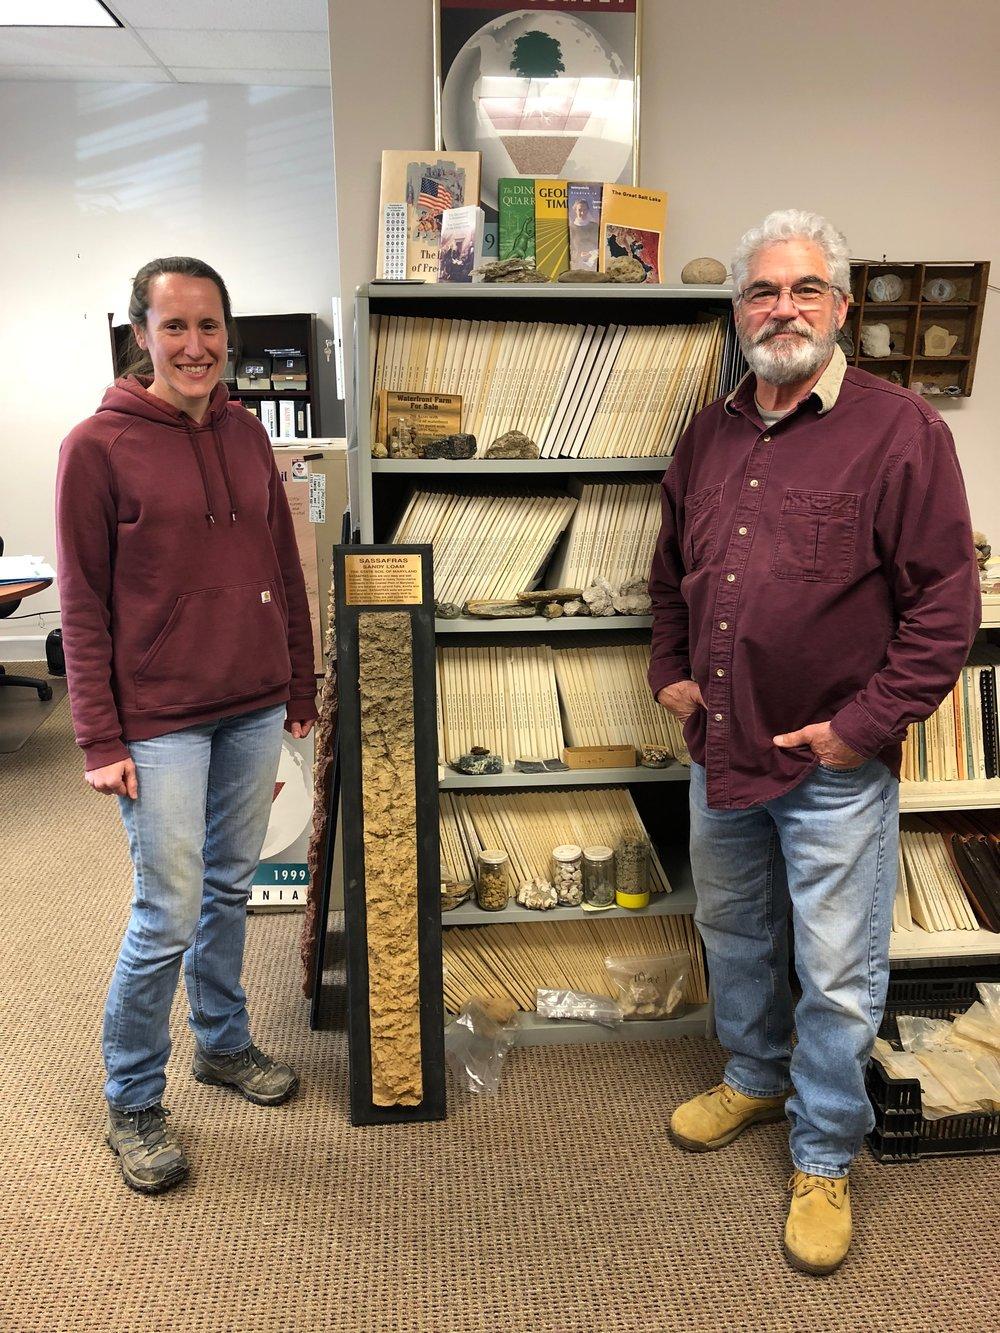 Annie Rossi and Jim Brewer, NRCS Soil Scientists